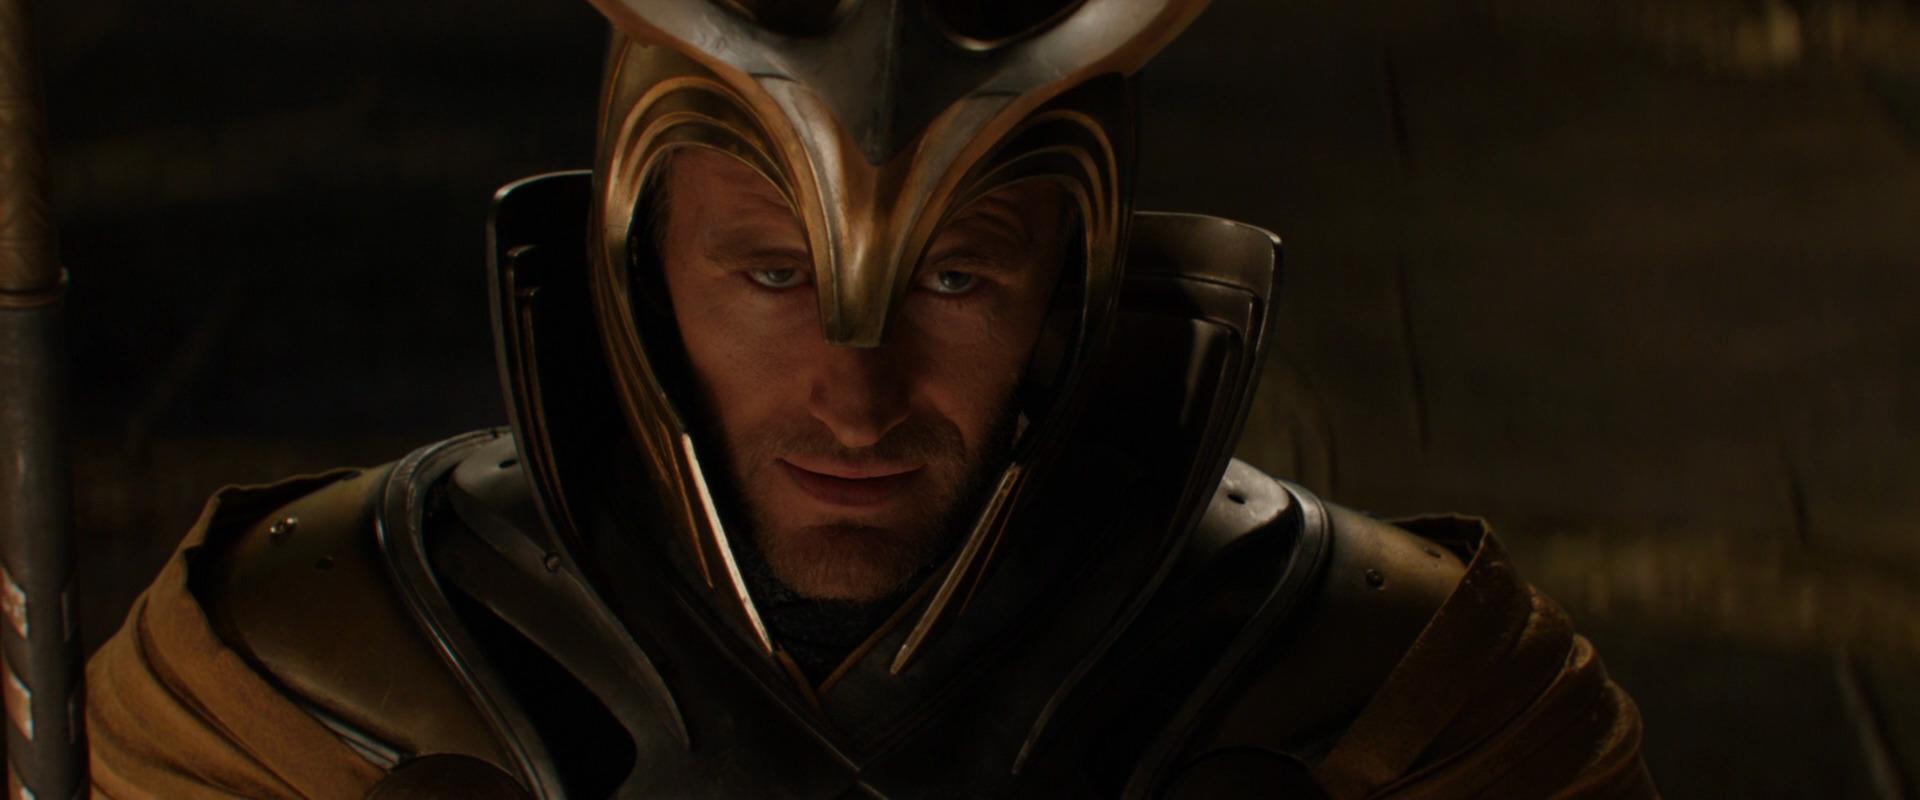 Anthony Hopkins Odin Thor: Ragnarok Loki Guard MovieSpoon.com